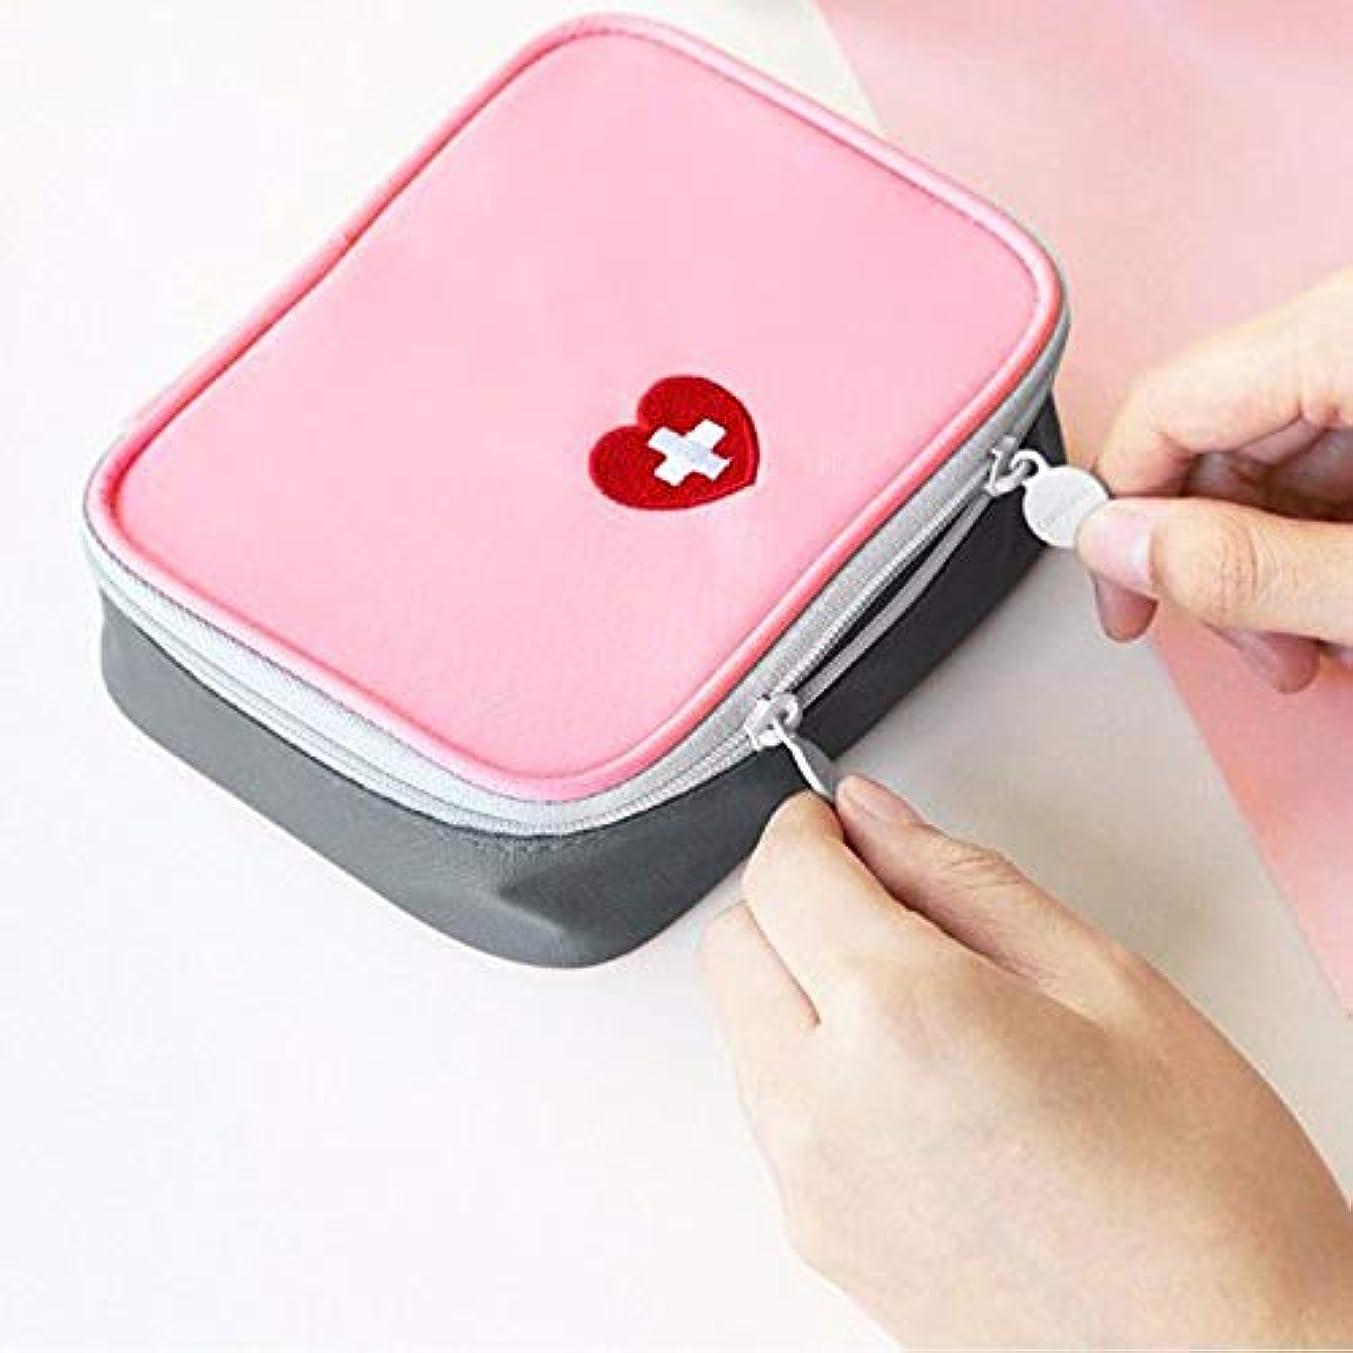 JJJJD 小型医療バッグの救急箱/医学の緊急のキットのオルガナイザー/屋外の世帯の薬袋 (Color : Pink)